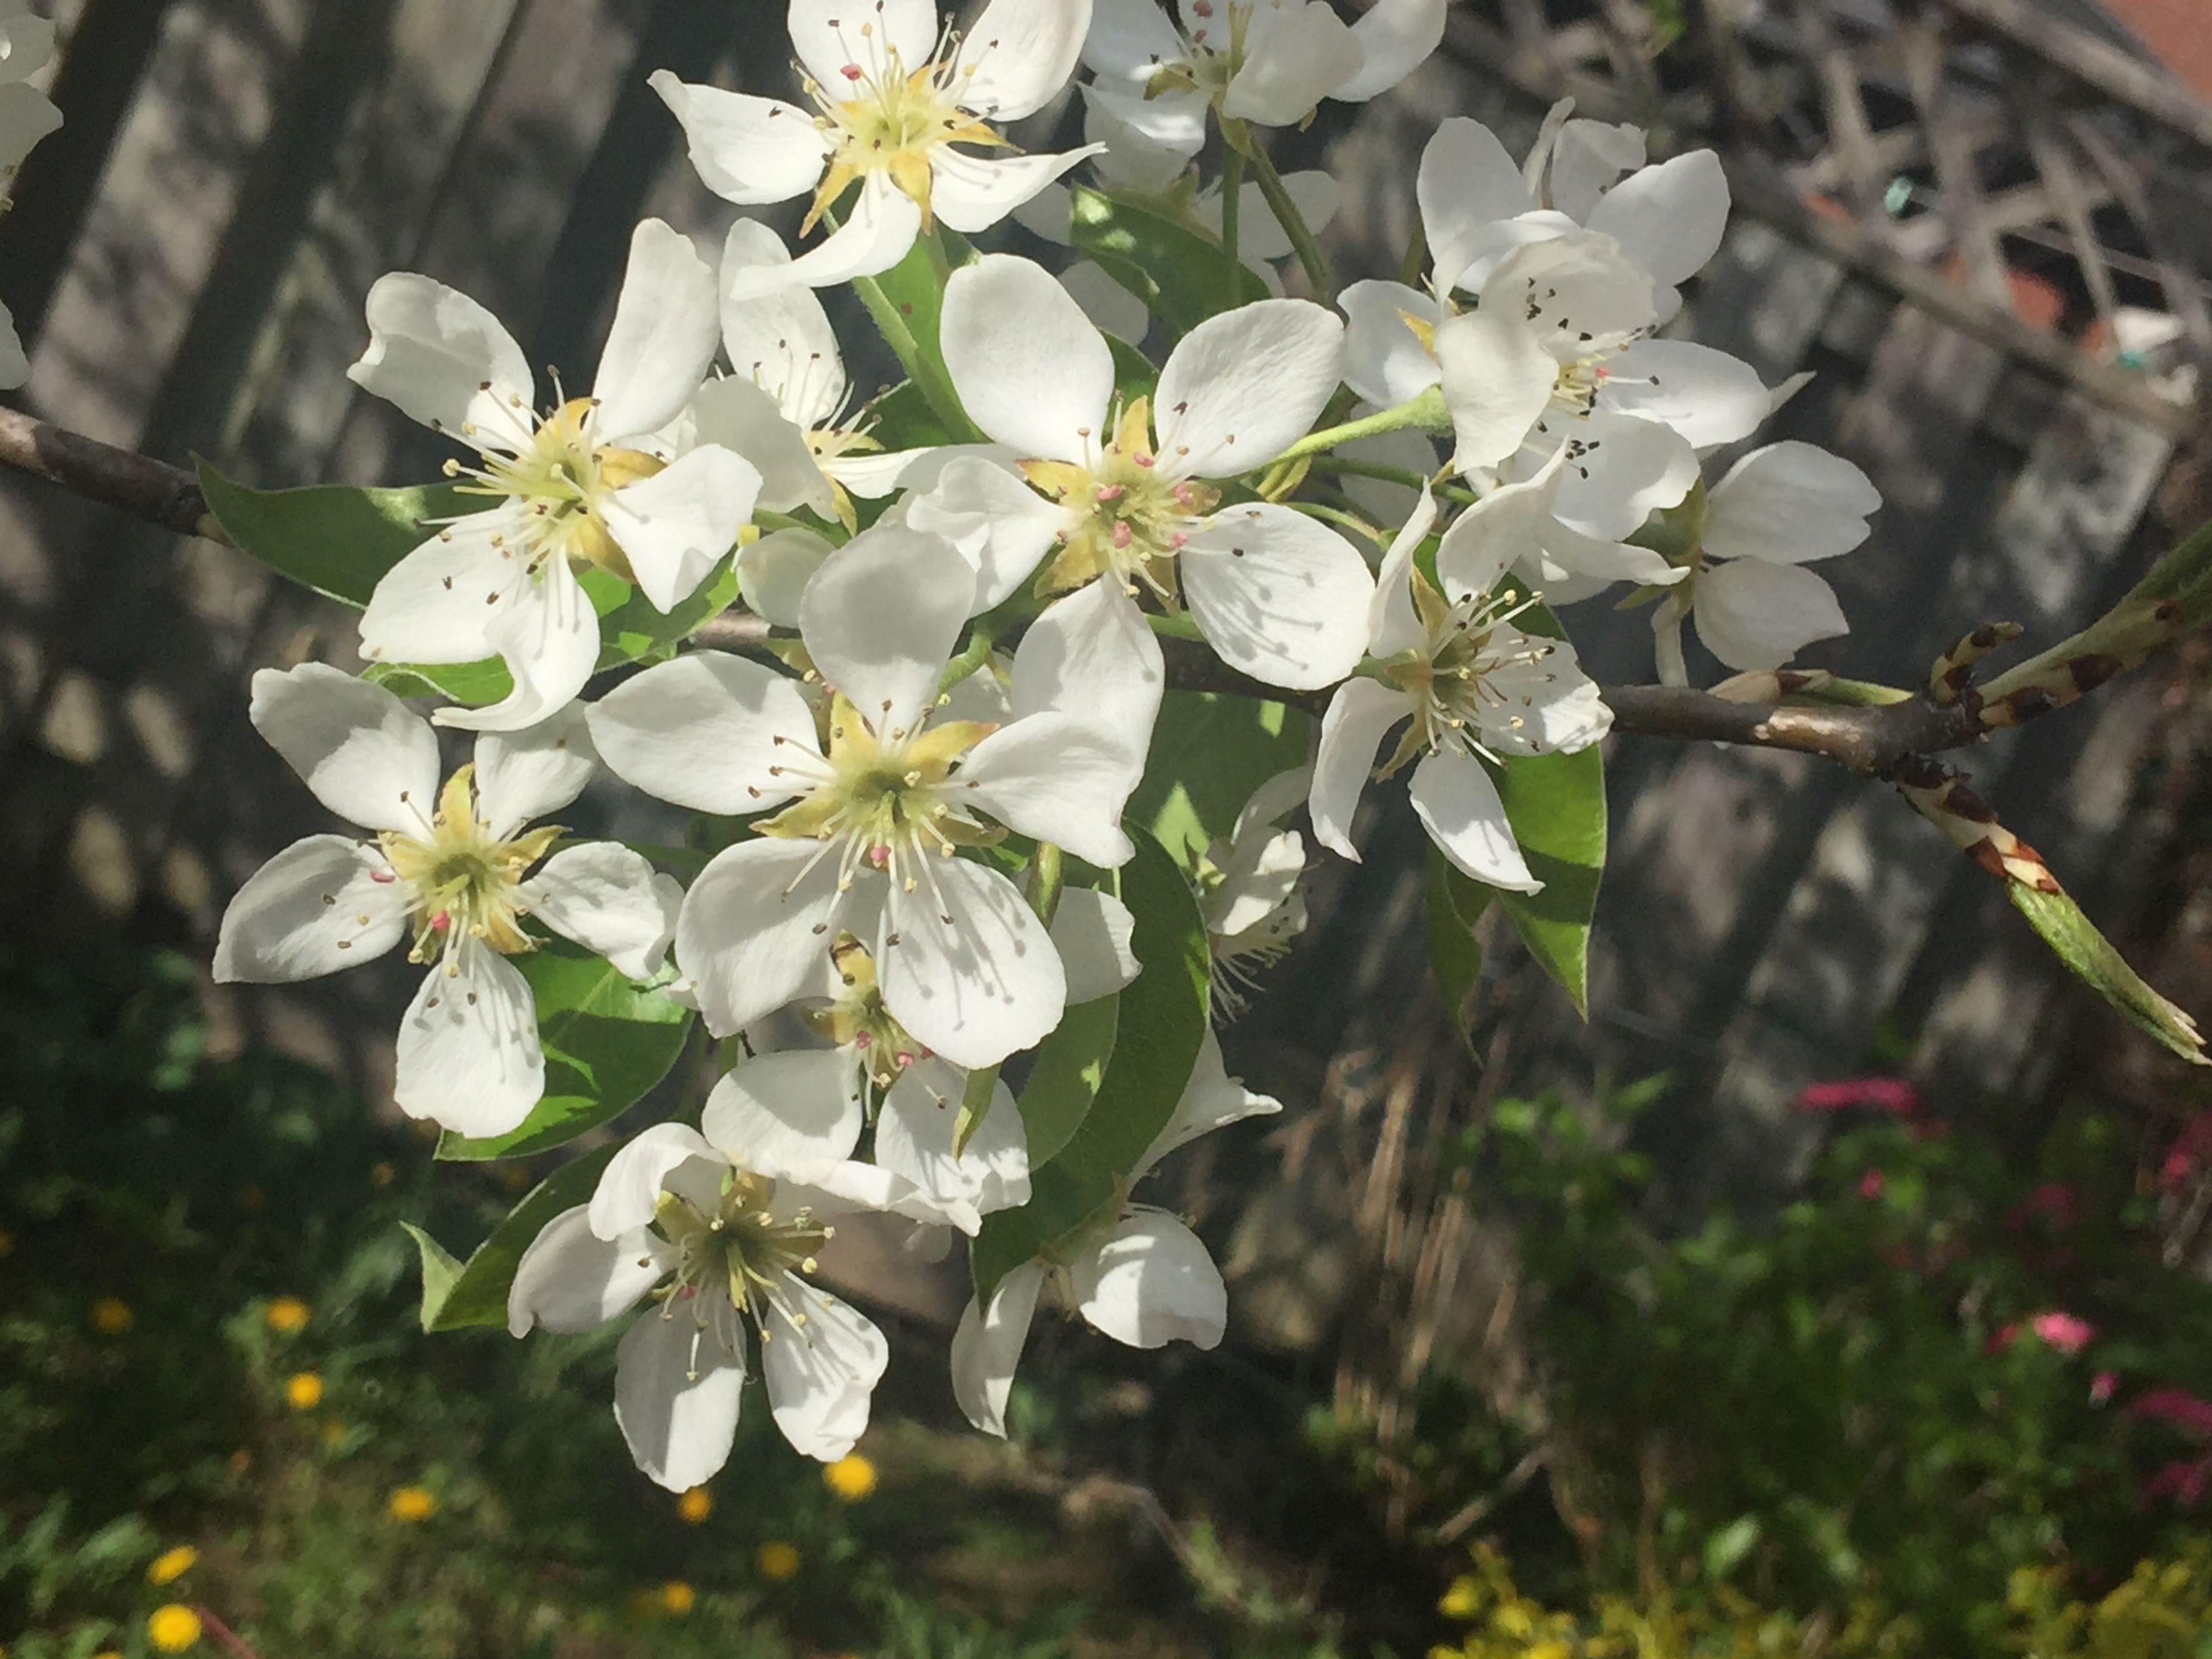 Underneath the sun- pearls flowers bloom- Tyra. D